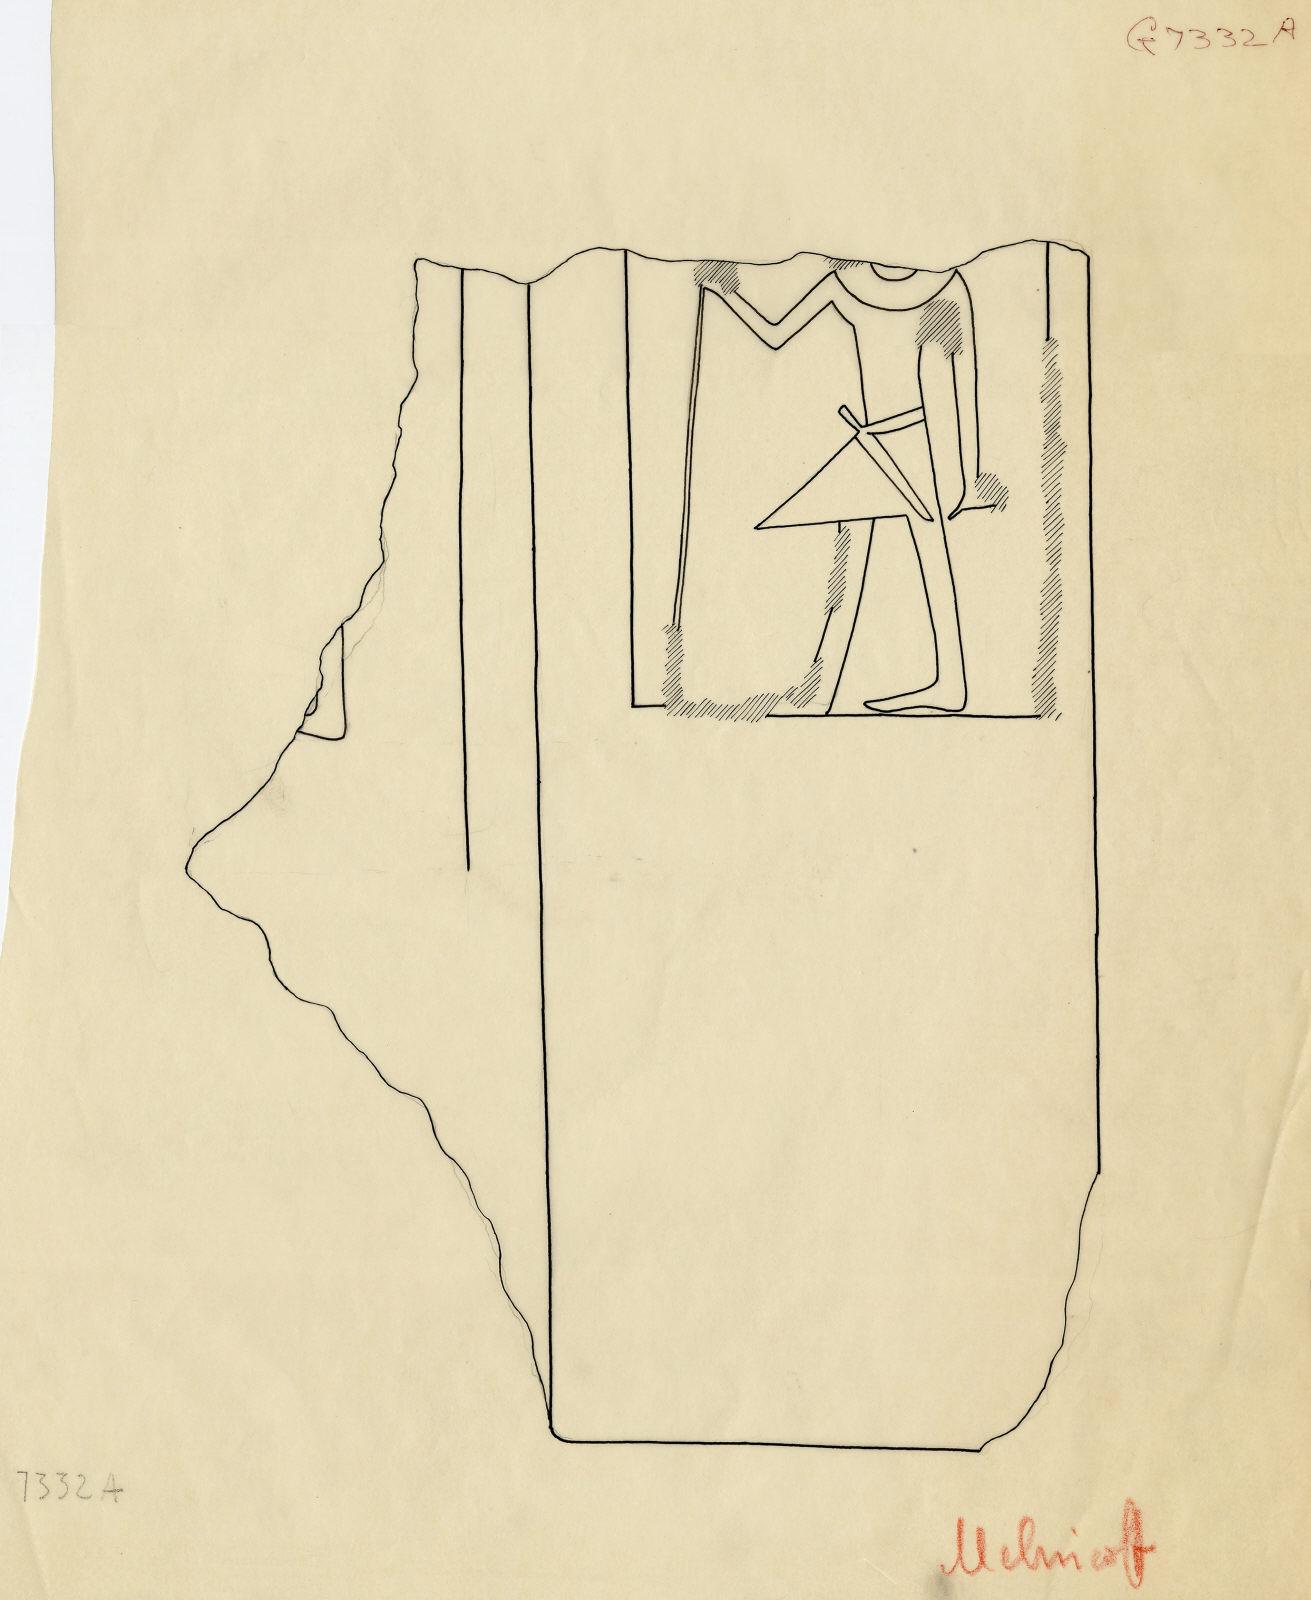 Drawings: G 7333: fragment of false door